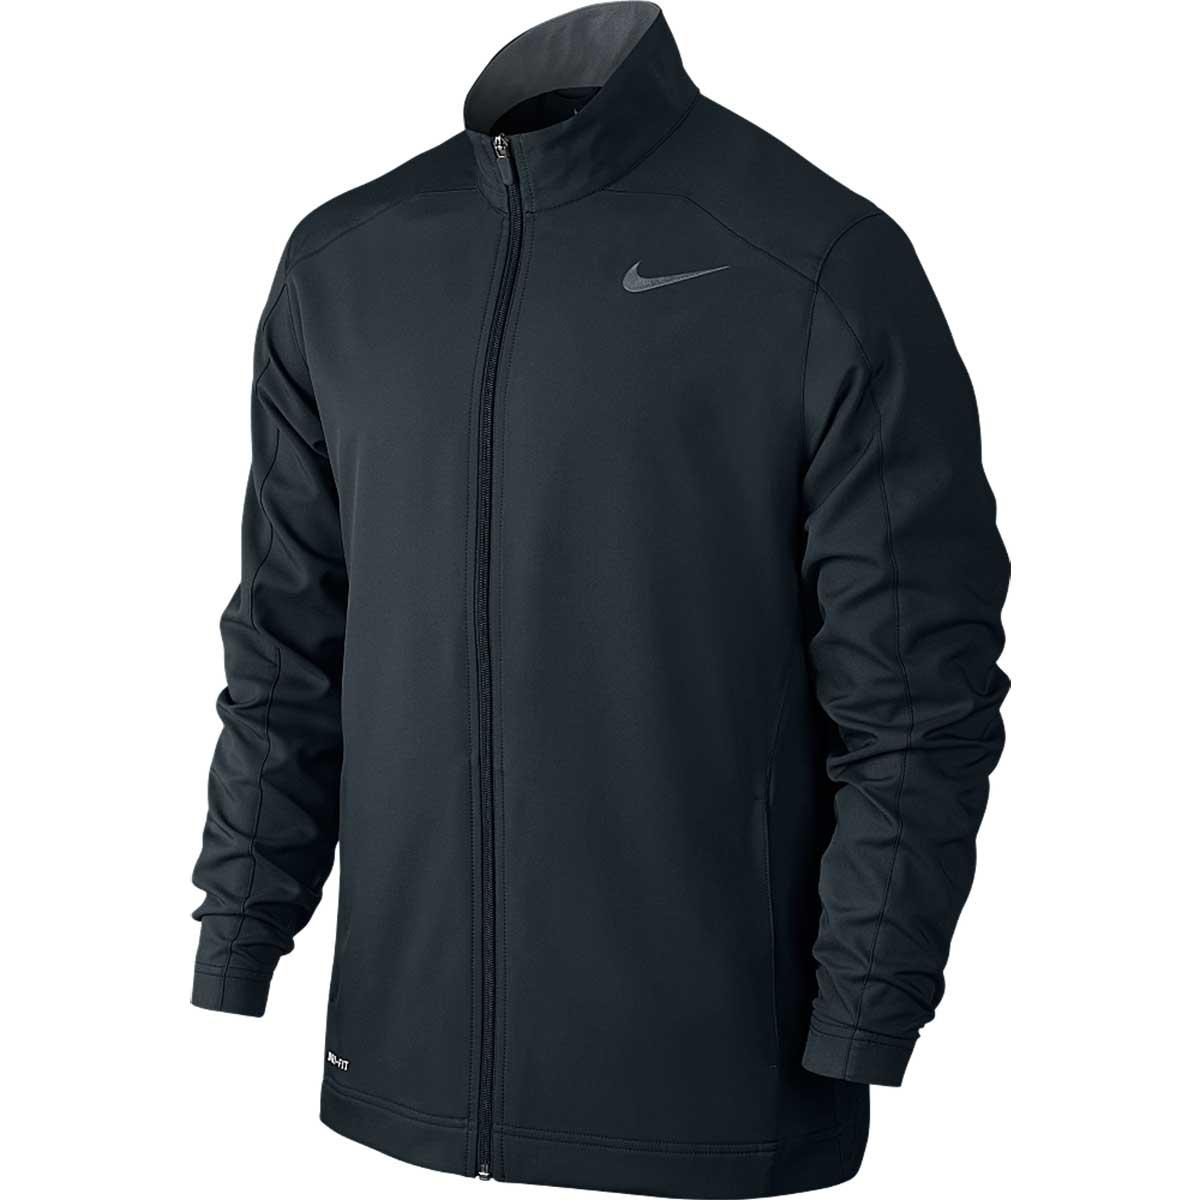 8c7c8739725b Buy Nike Team Woven Jacket (Black) Online India